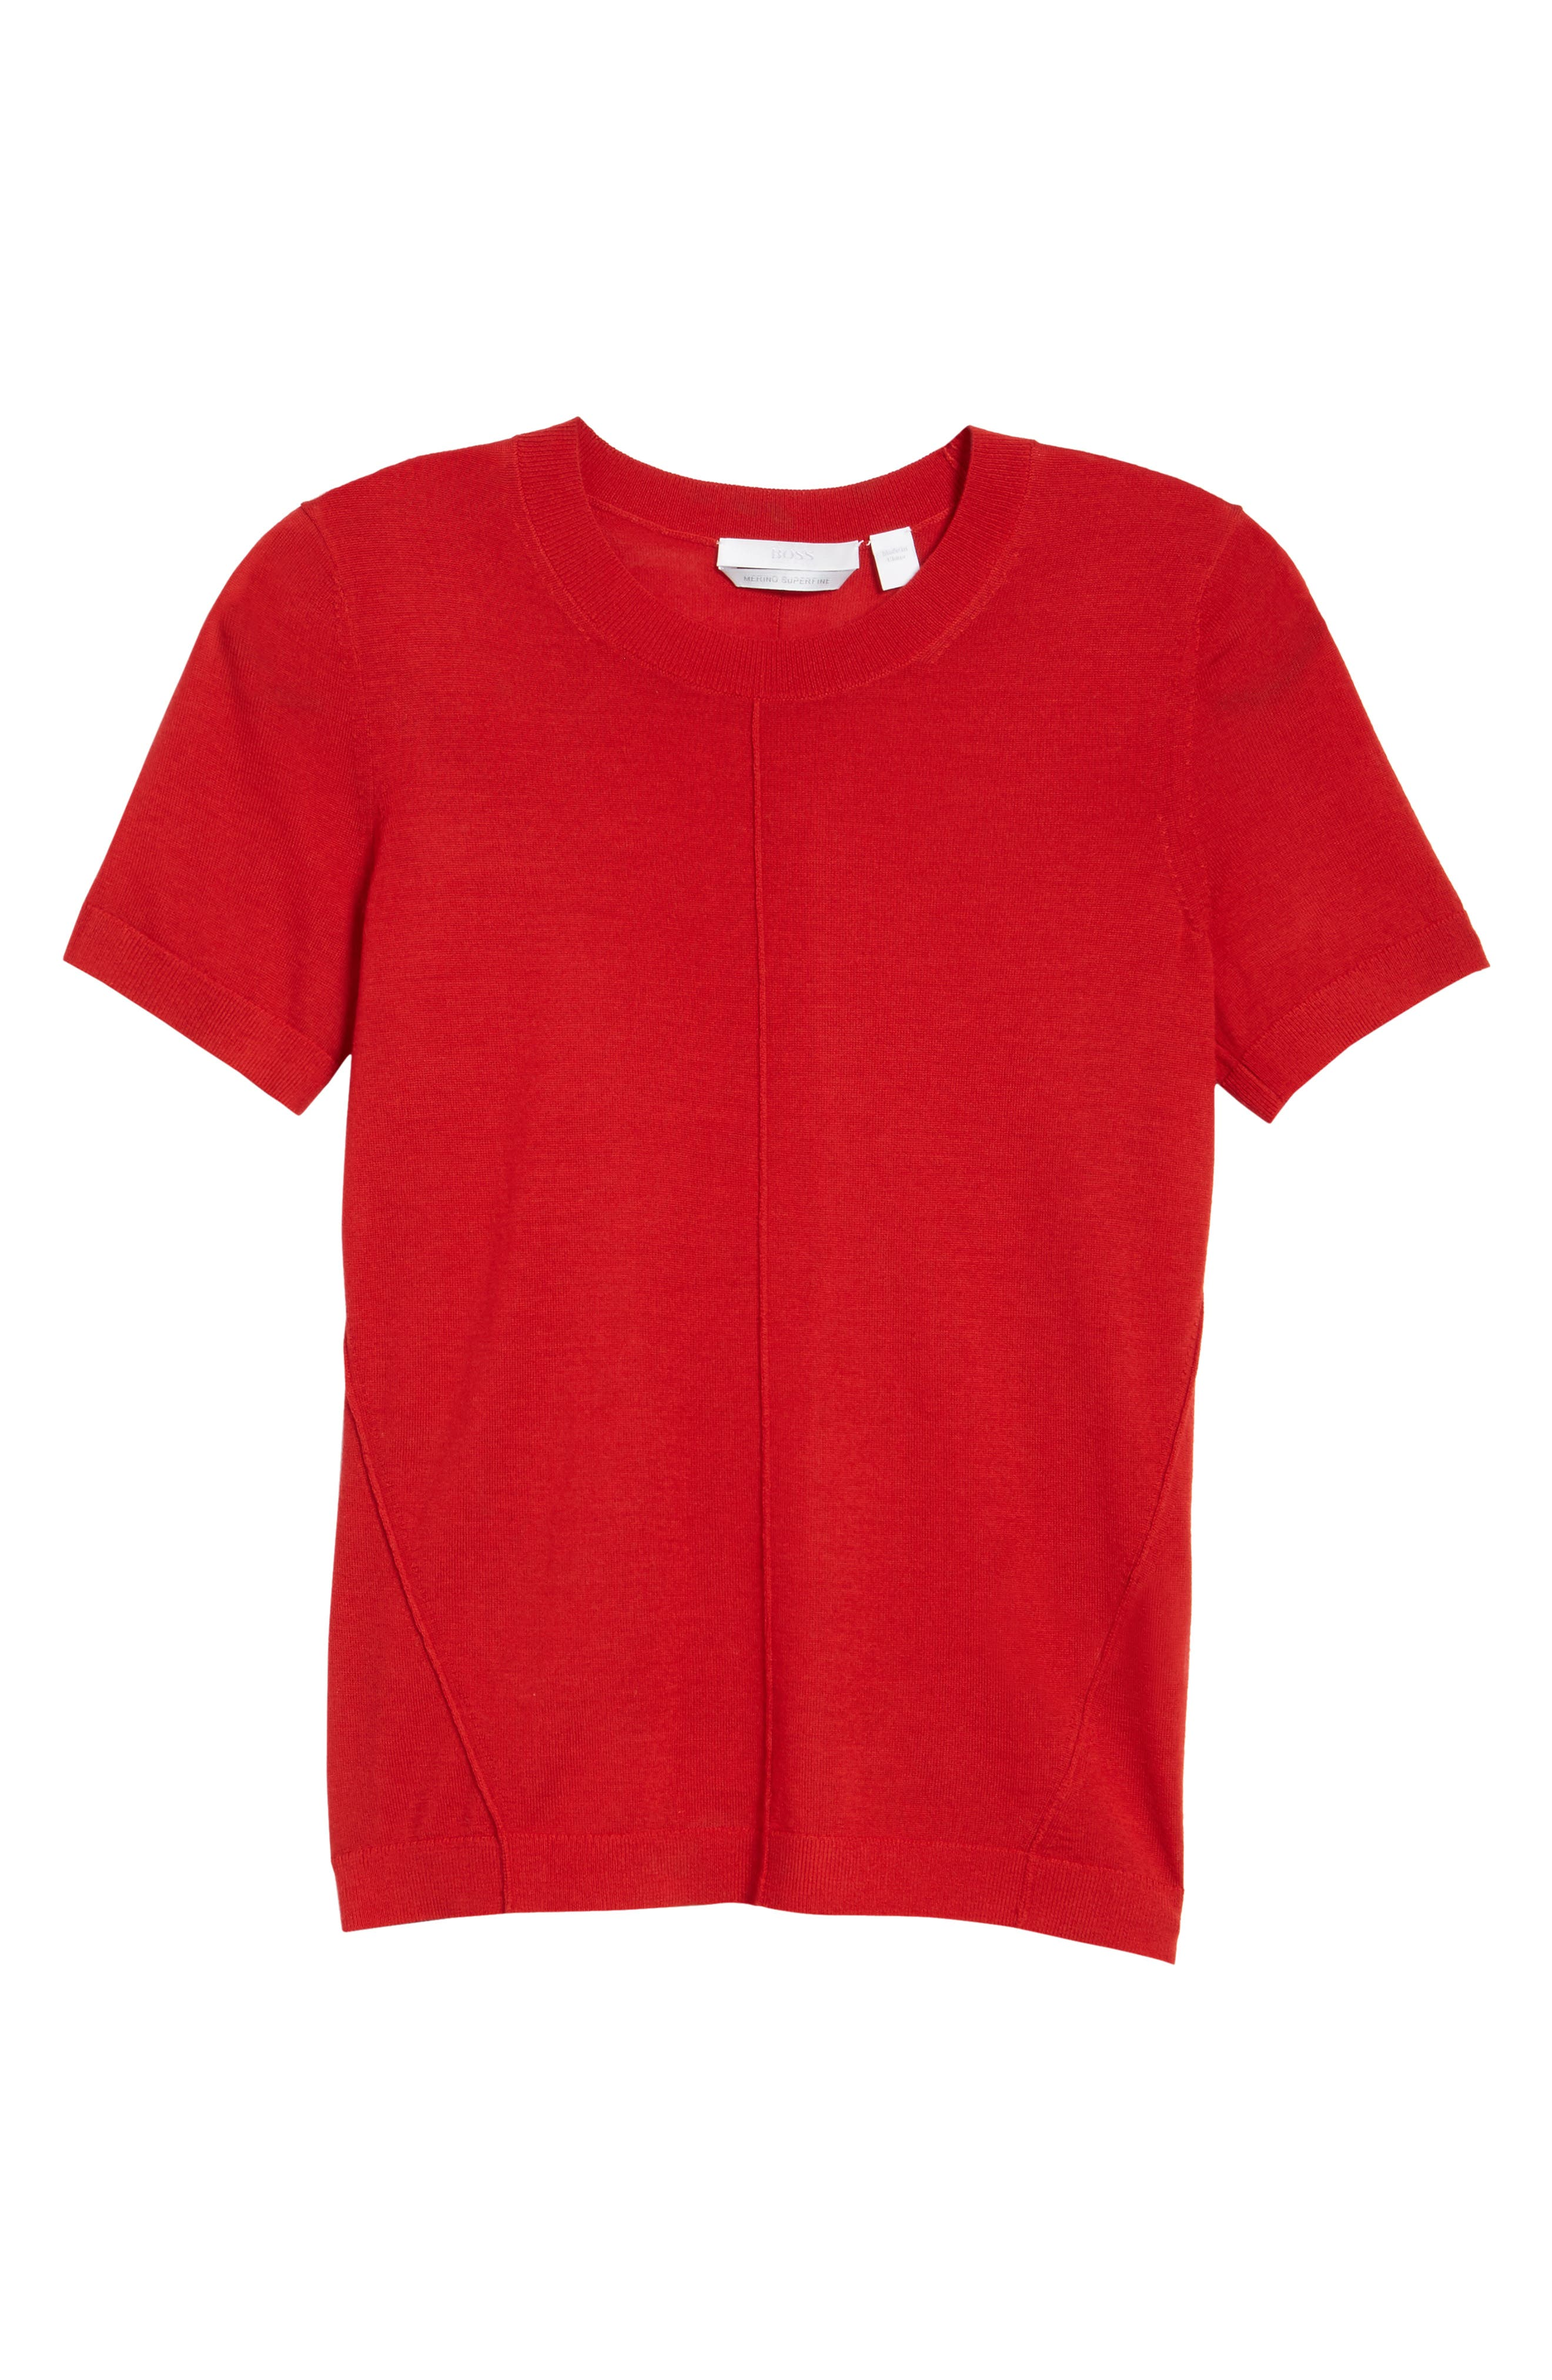 Fuyuka Wool Sweater,                             Alternate thumbnail 6, color,                             Crimson Red